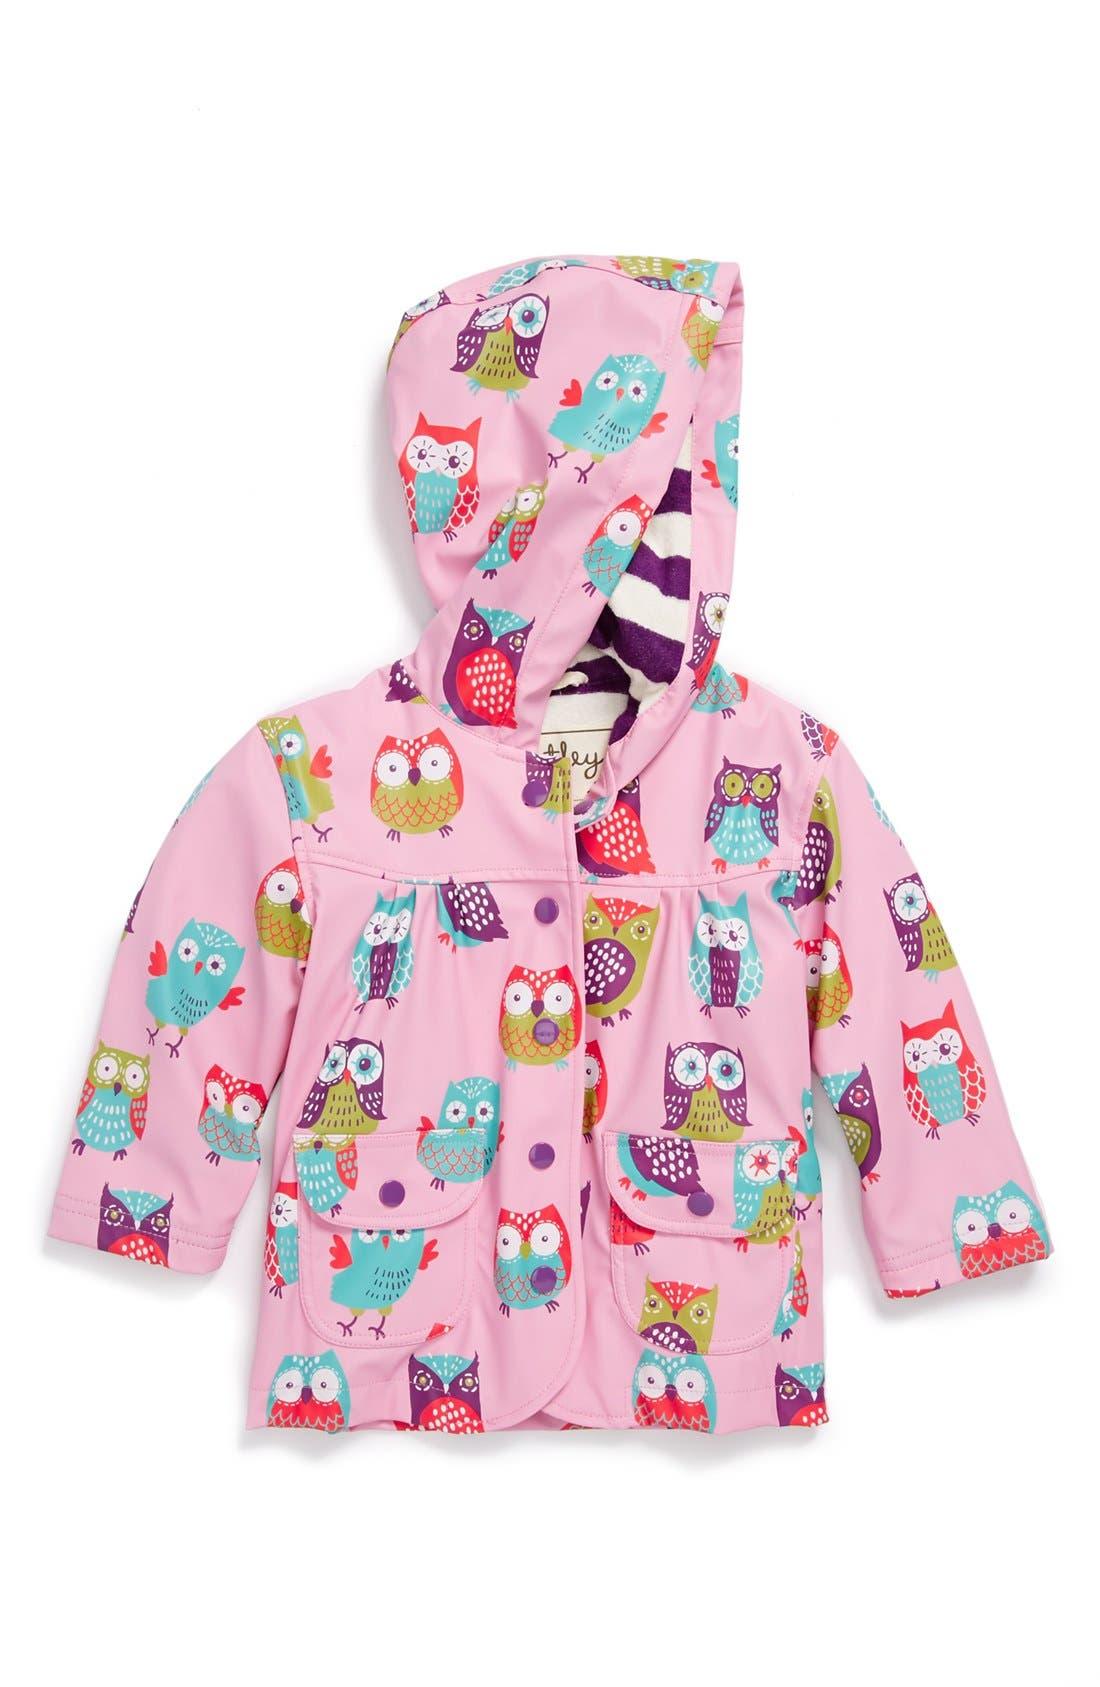 Alternate Image 1 Selected - Hatley 'Party Owls' Rain Jacket (Toddler Girls, Little Girls & Big Girls)